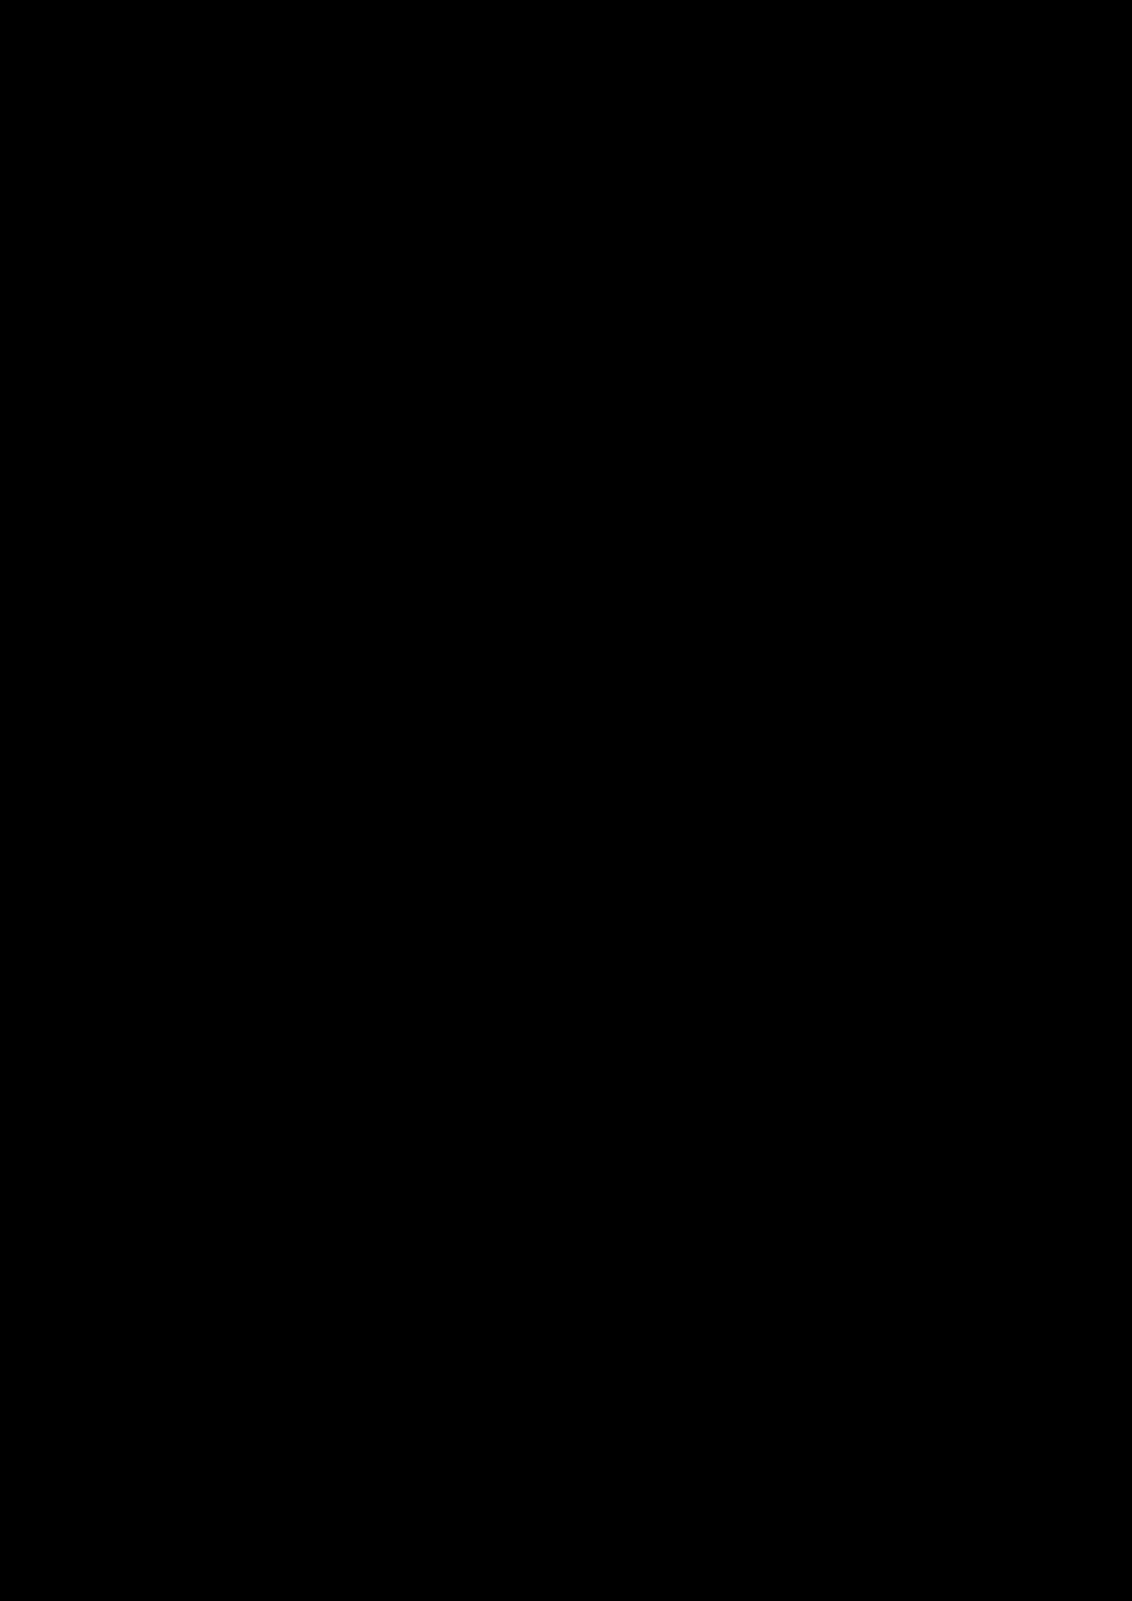 Korolevstvo slez slide, Image 35